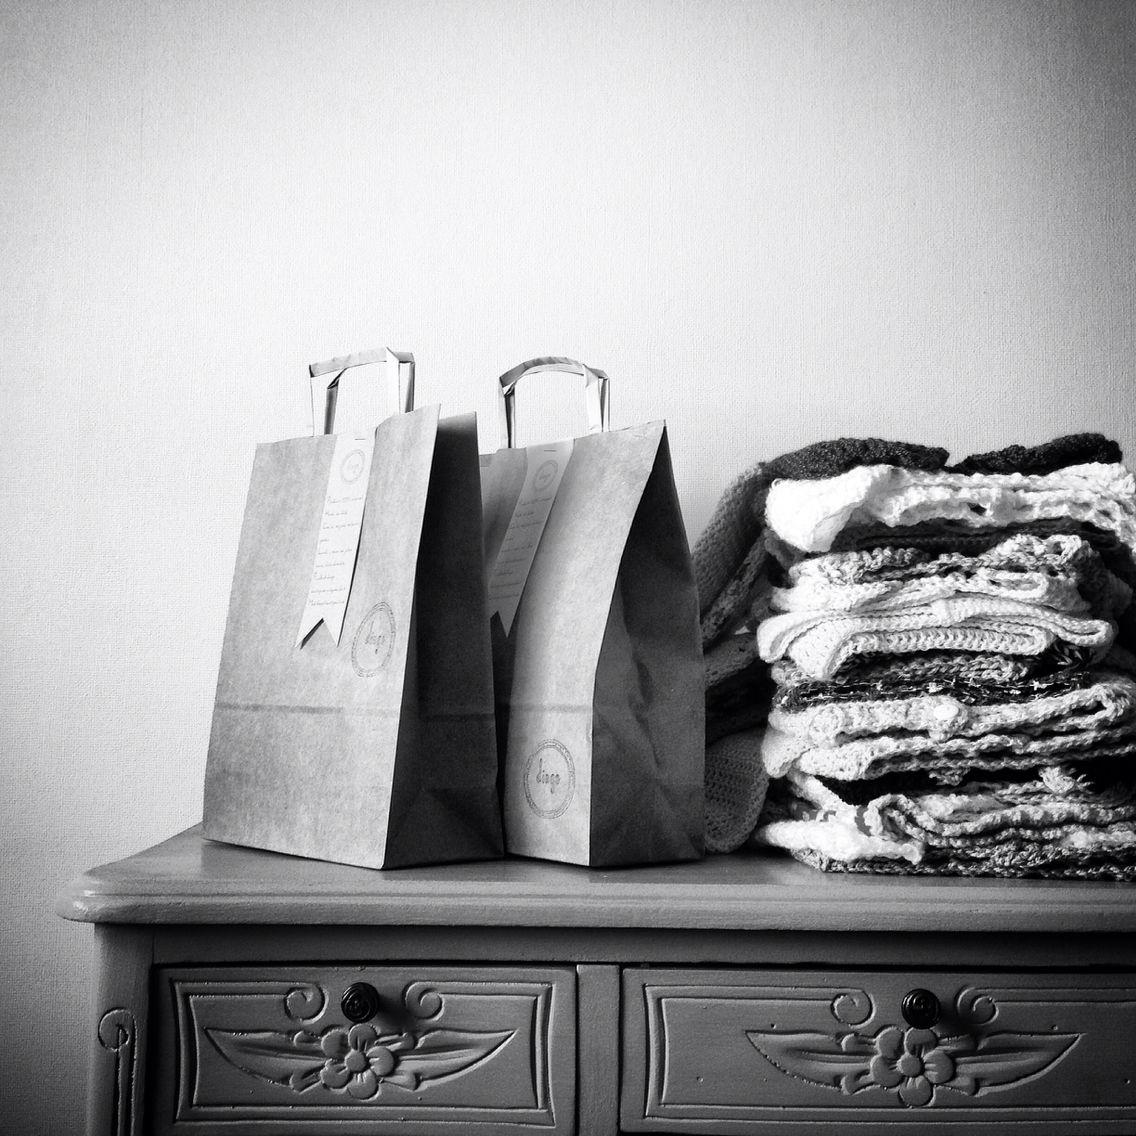 Chalequitos, chaquetas, zapatitos y gorritos para guaguas tejidos a mano   A pedido o entrega inmediata según disponibilidad   Mail: dingelanas@gmail.com   Instagram: DingeLanas   Facebook: Dinge   #dingelanas